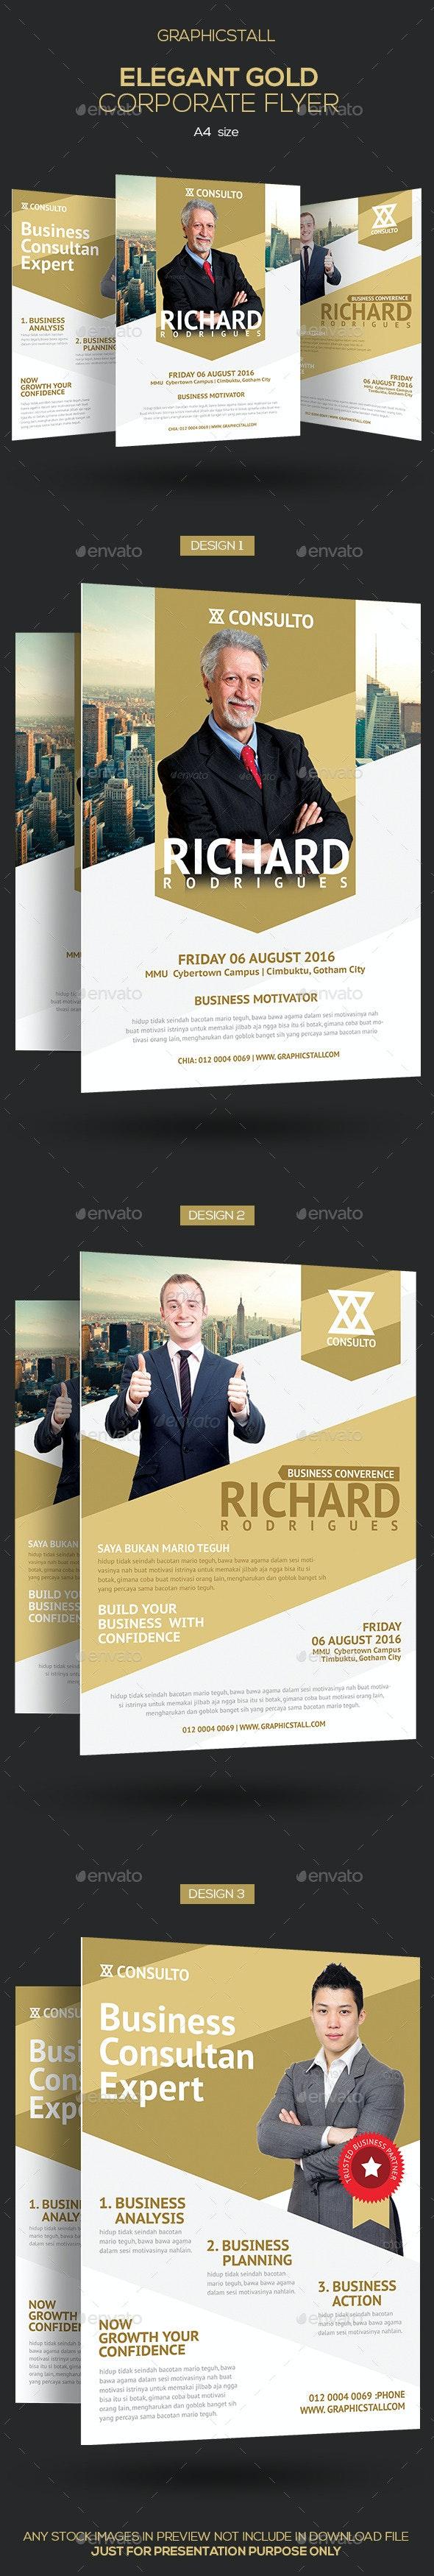 Elegant Gold Corporate Flyer - Corporate Flyers